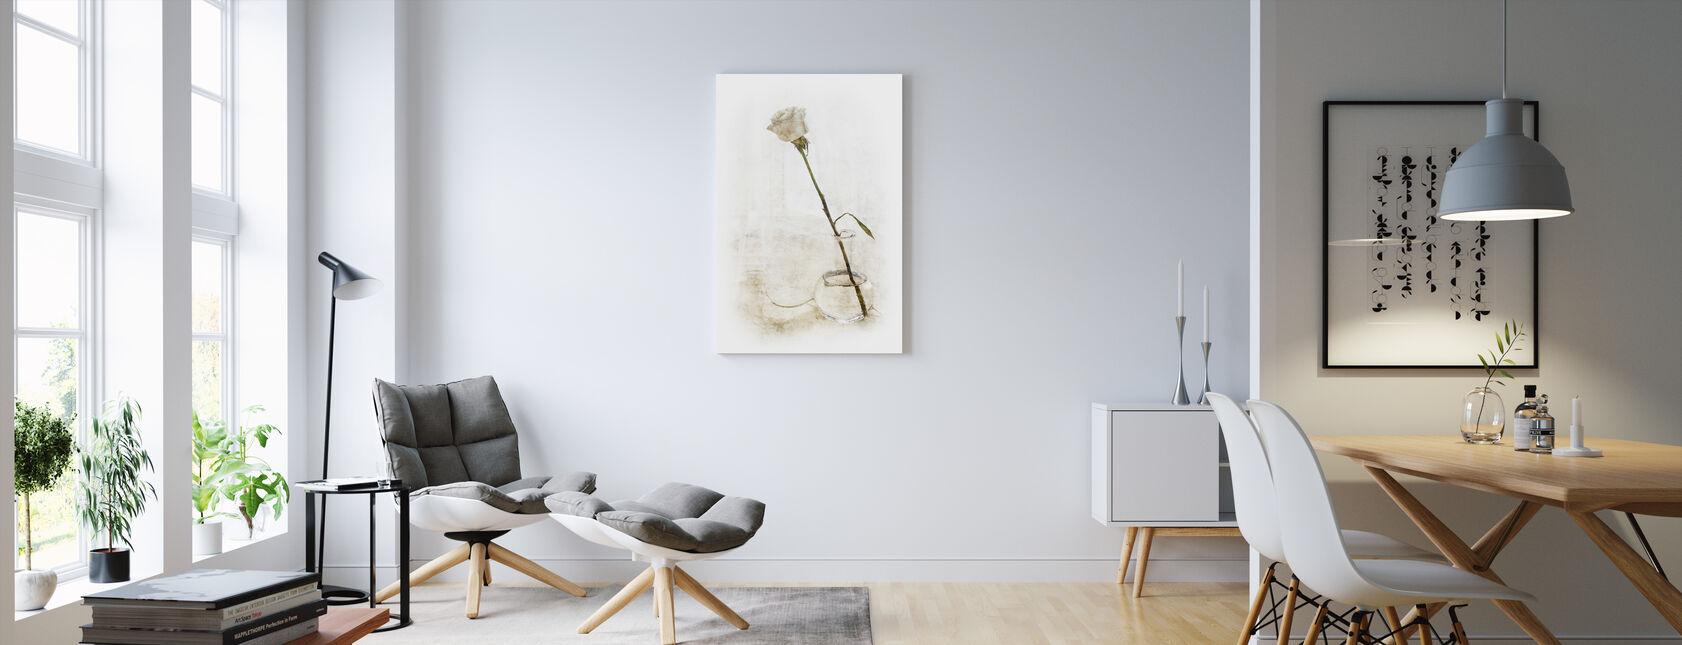 Decanter - Canvas print - Living Room